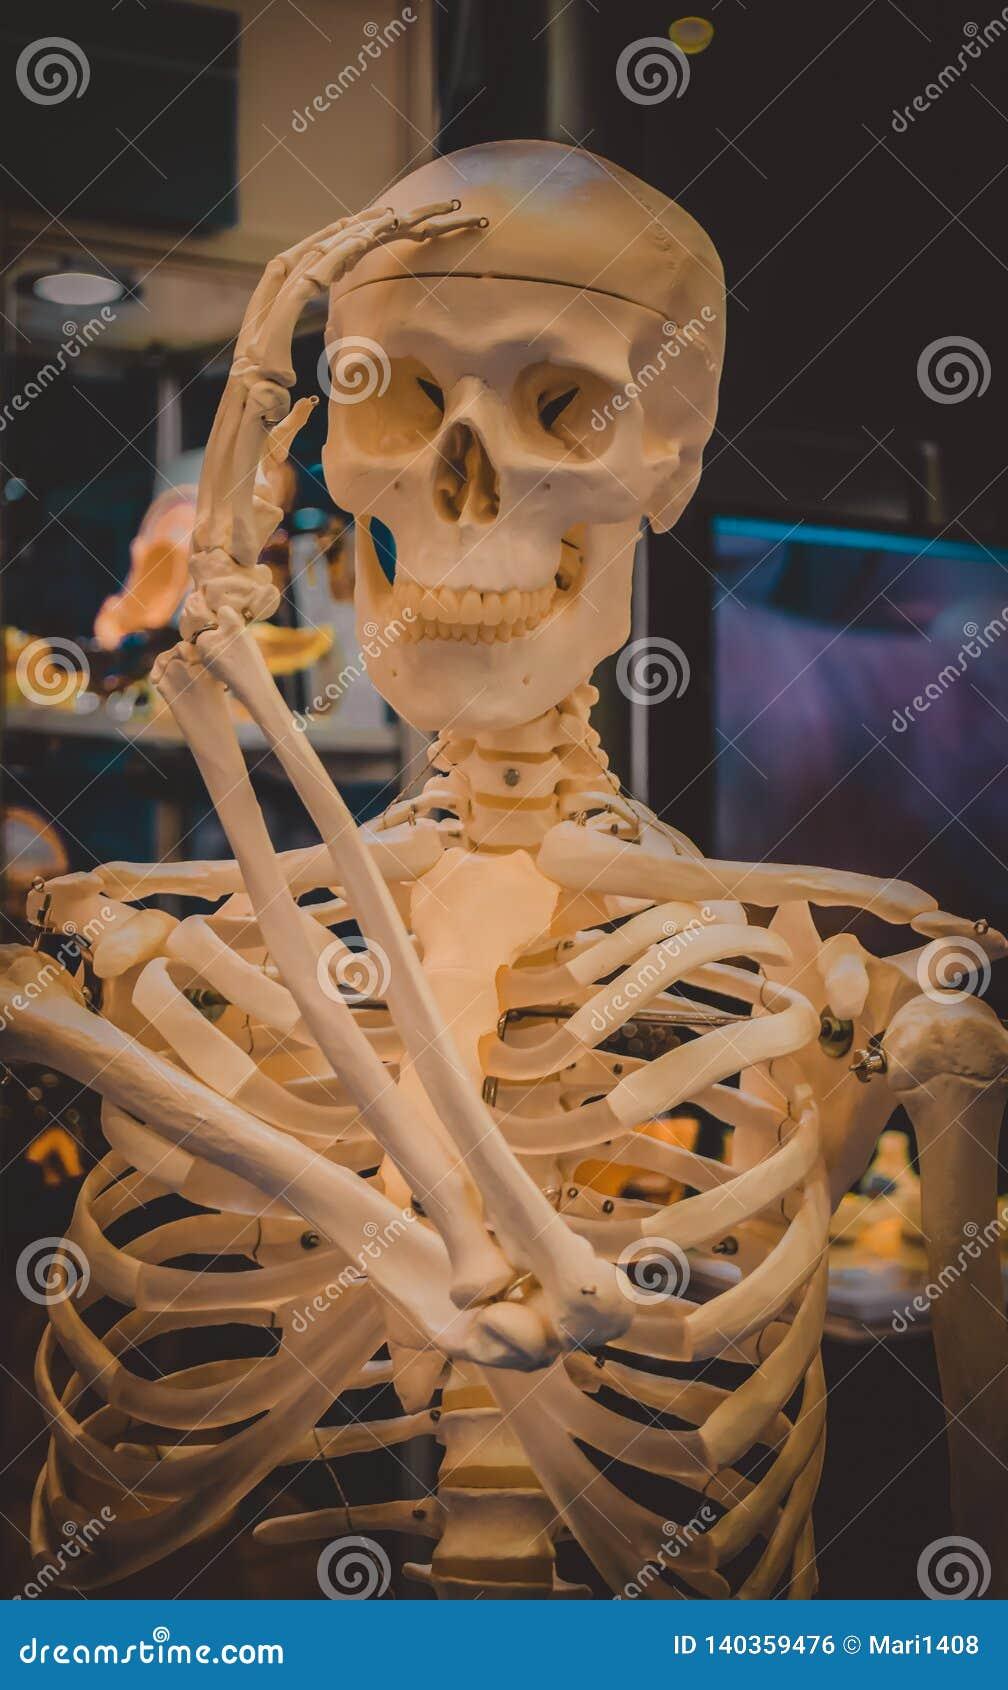 Human skeleton and layout of a human skull closeup,